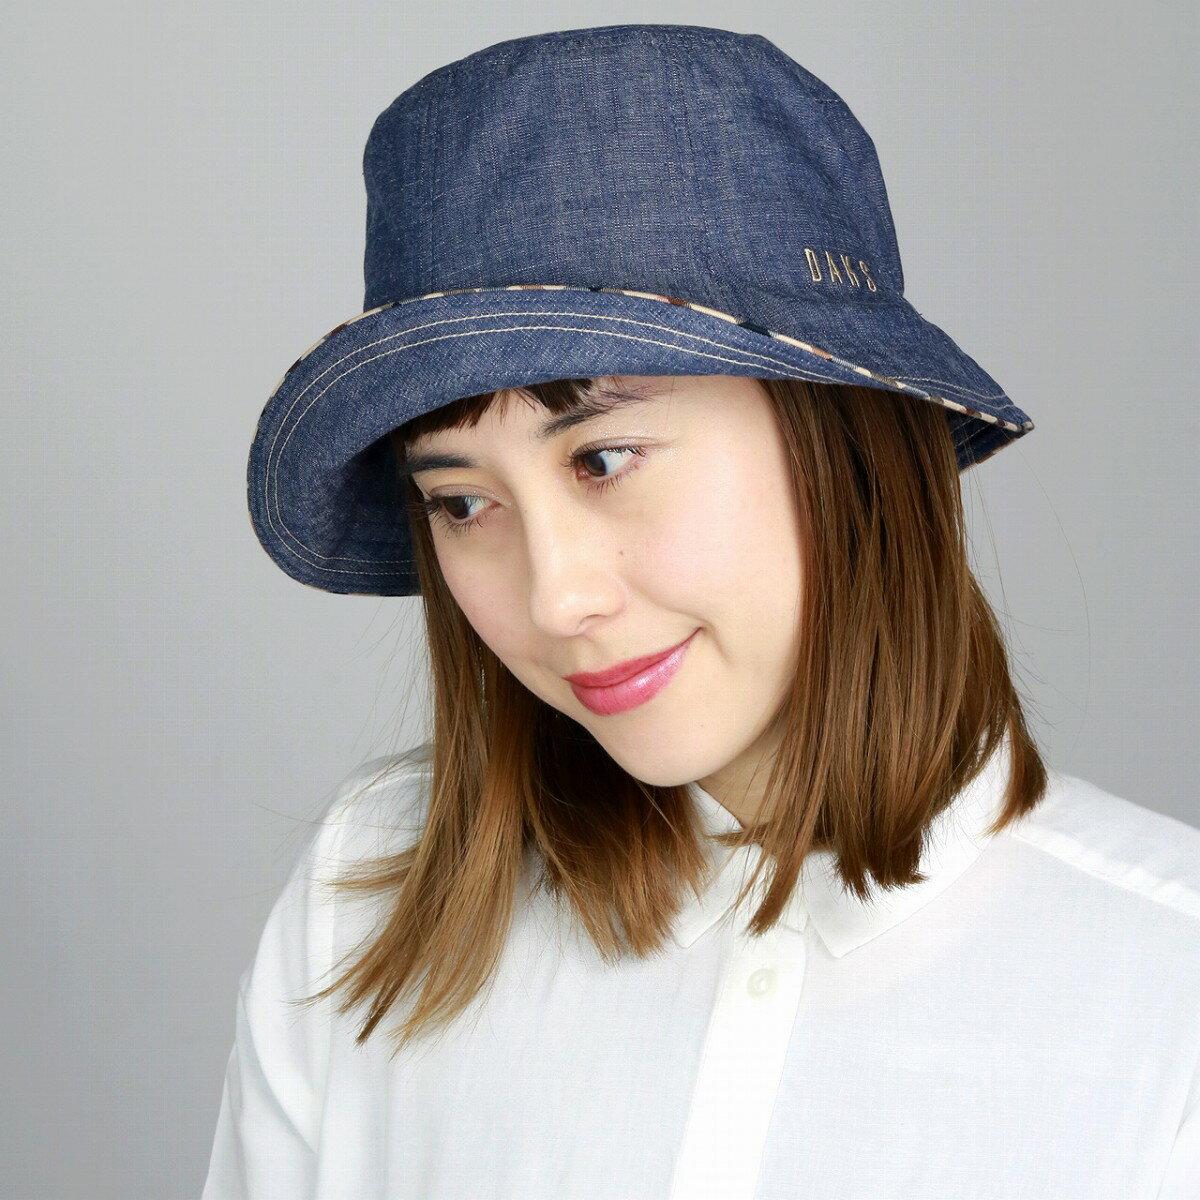 DAKS ダックス ハット 日よけ レディース 帽子 紫外線対策 春夏 コットン100% 先染 チューリップオブザー 婦人帽子 ブランド帽子 ネイビー 紺 [floppy hat](40代 50代 60代 70代 ファッション アウトドア チューリップハット プレゼント UVカット帽子 誕生日 ぼうし)